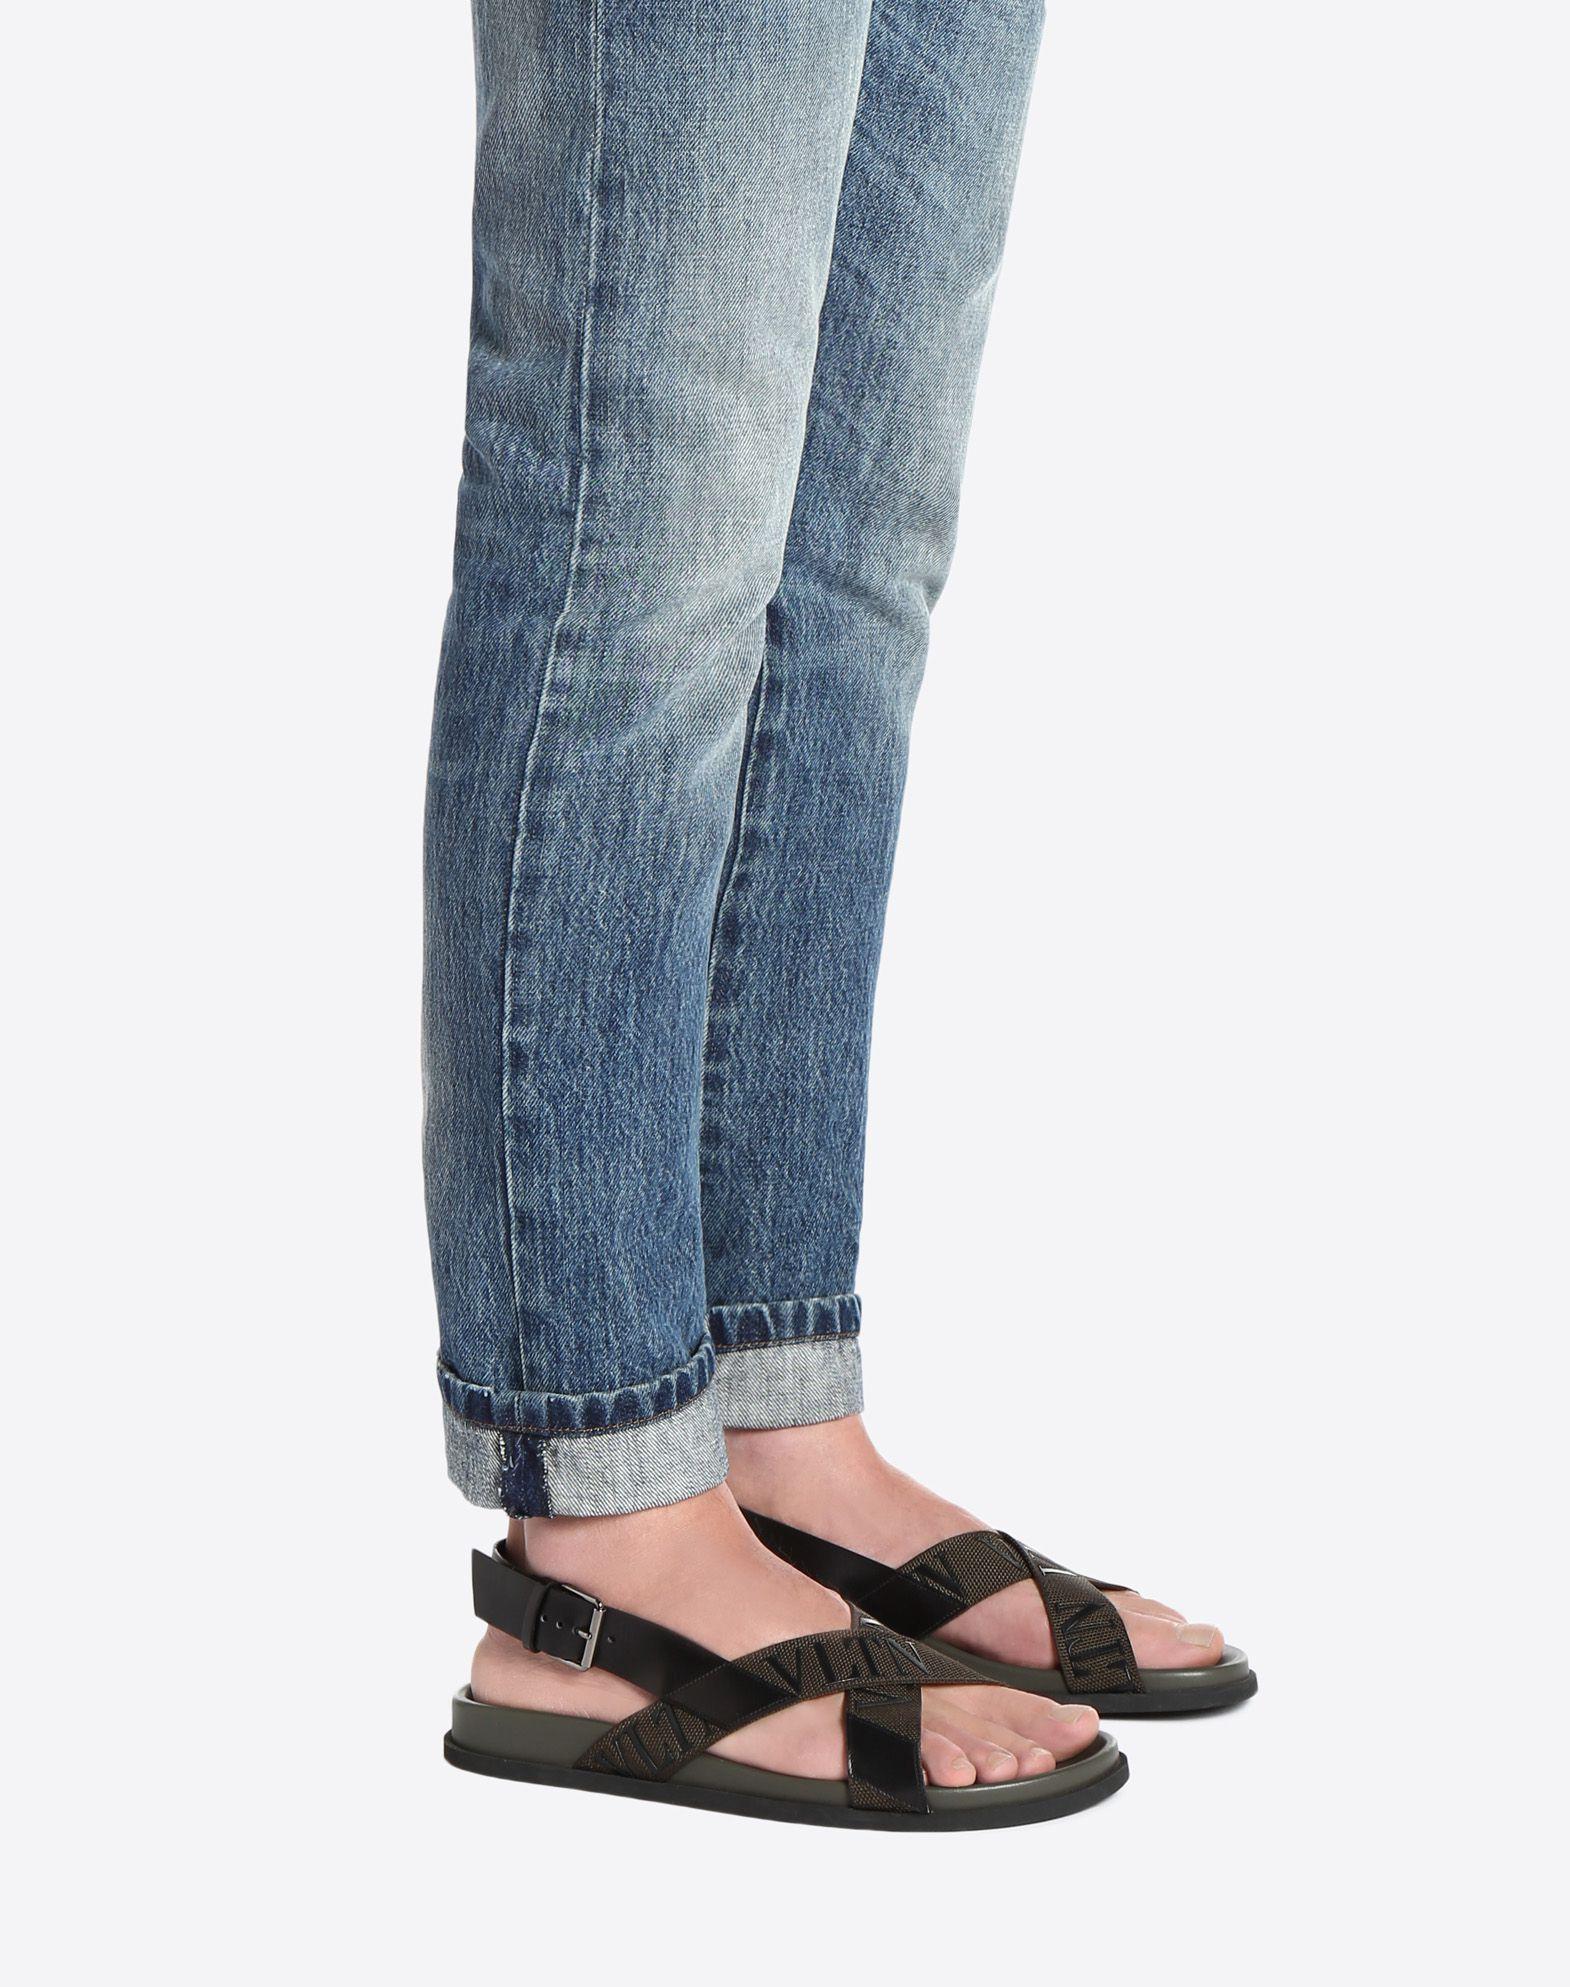 VALENTINO GARAVANI UOMO Low VLTN sandal  FLAT SANDALS U a